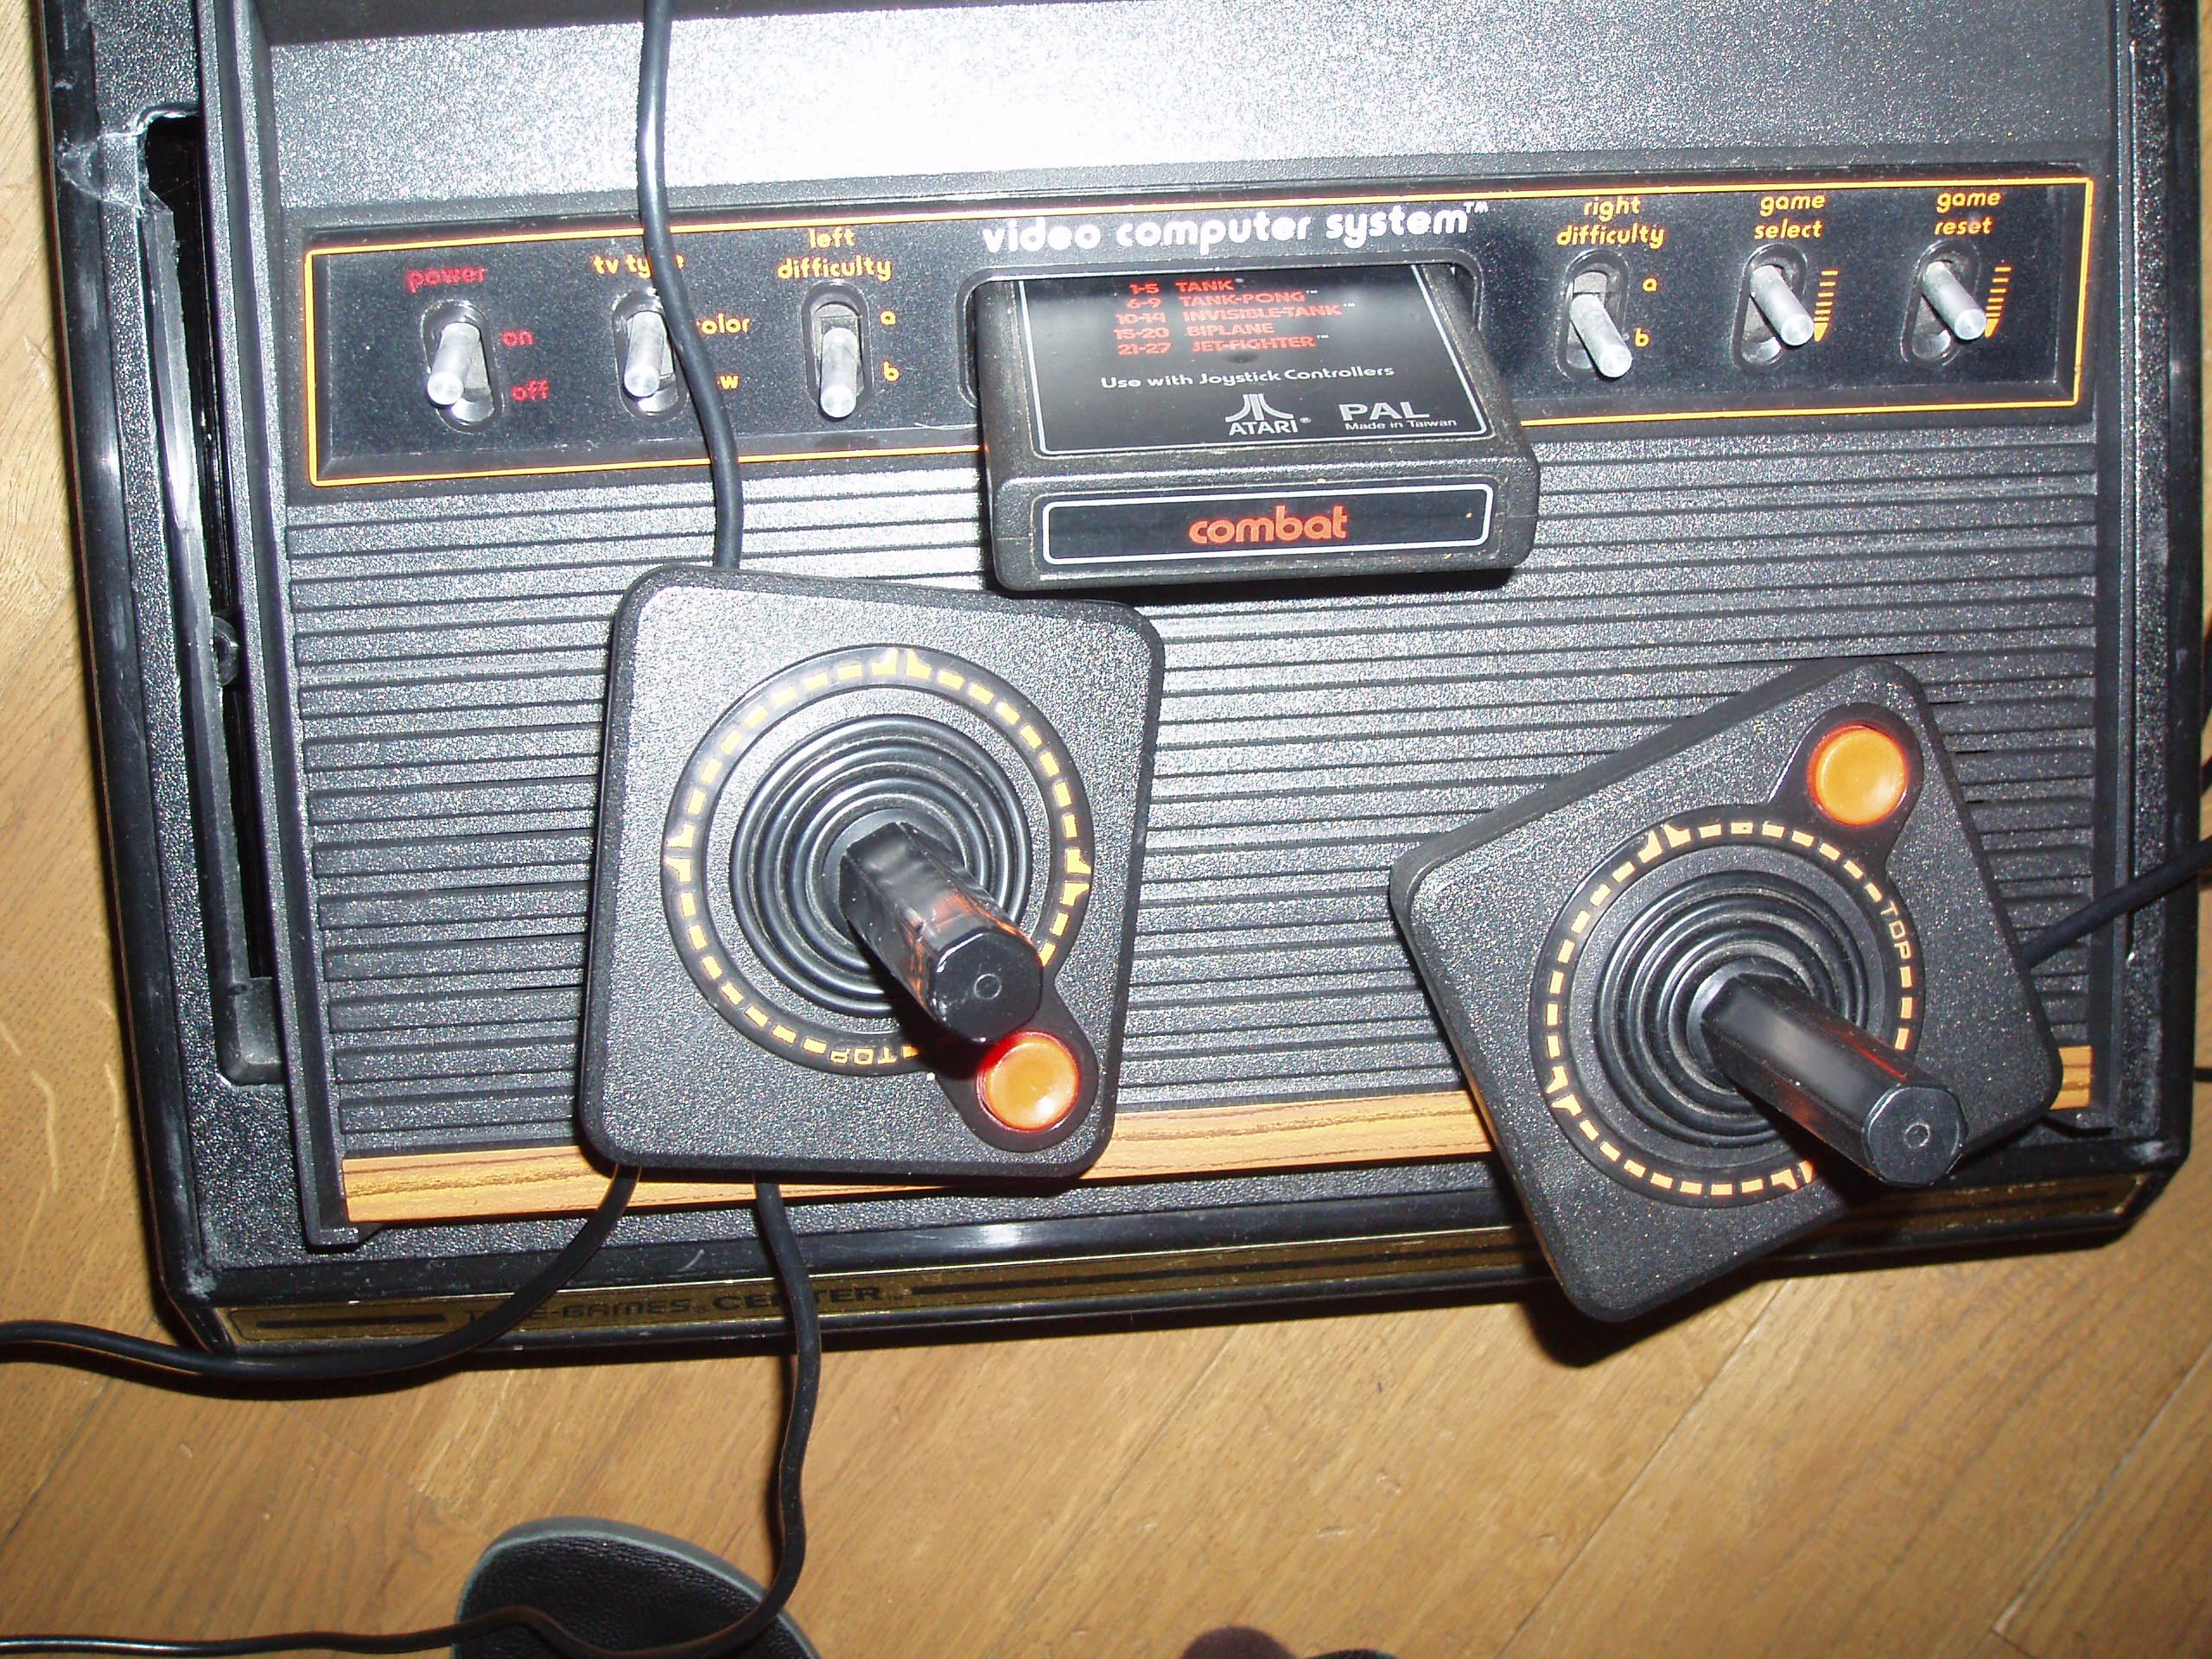 atari2600forever: Combat: Game 1 (Atari 2600 Novice/B) 32 points on 2019-03-18 09:48:49